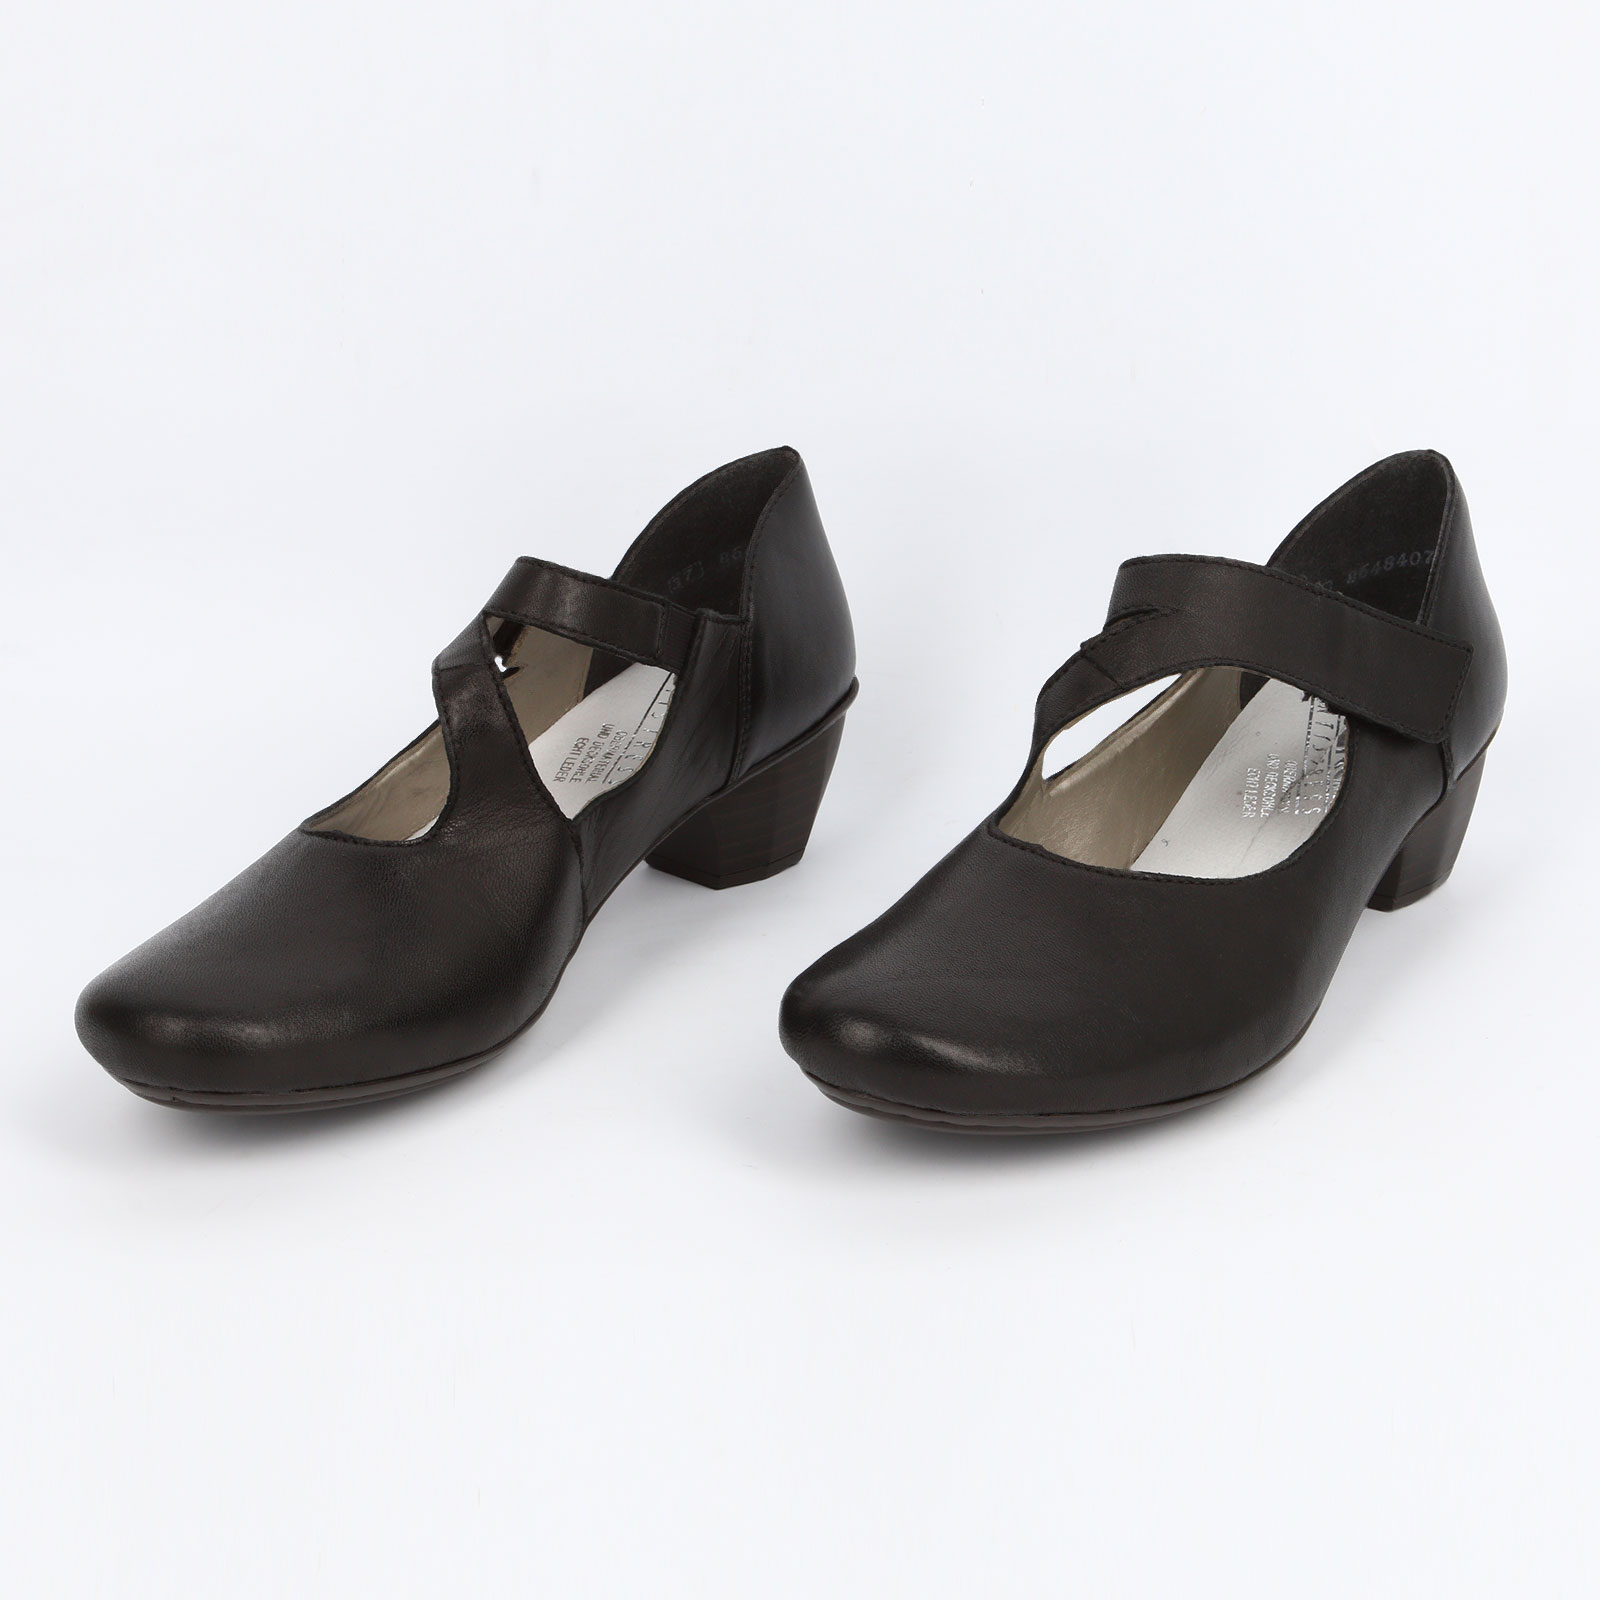 Летние женские туфли на наборном каблуке